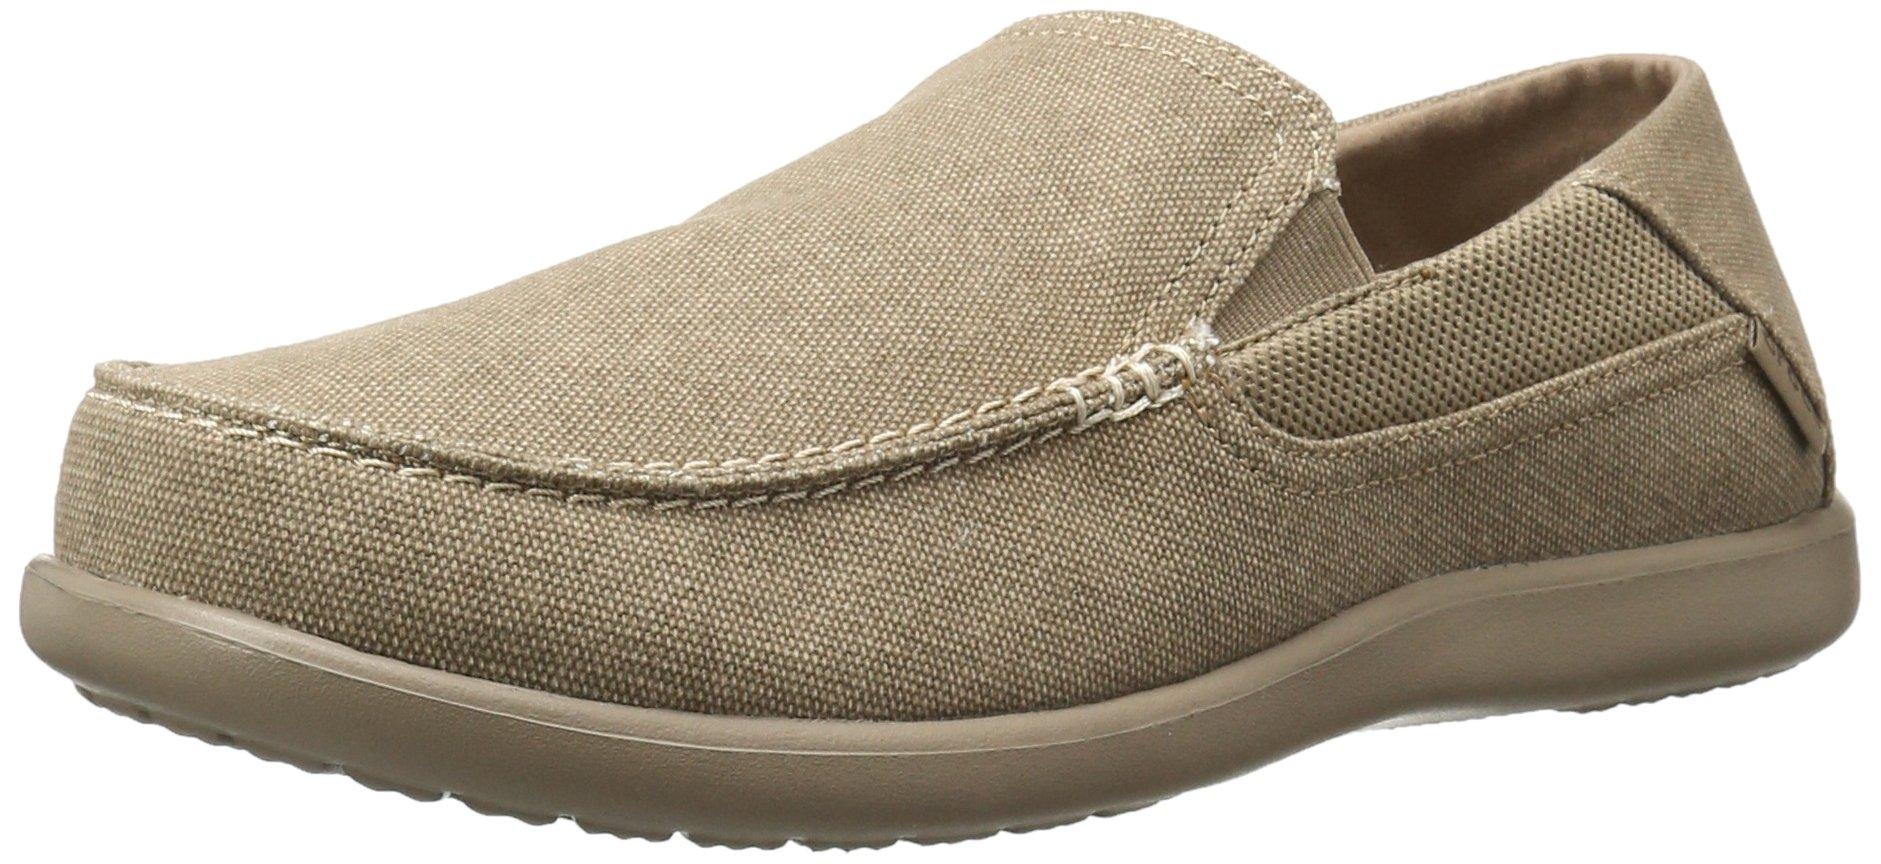 Crocs Men's Santa Cruz 2 Luxe M Slip-On Loafer, Khaki/Khaki, 10 M US